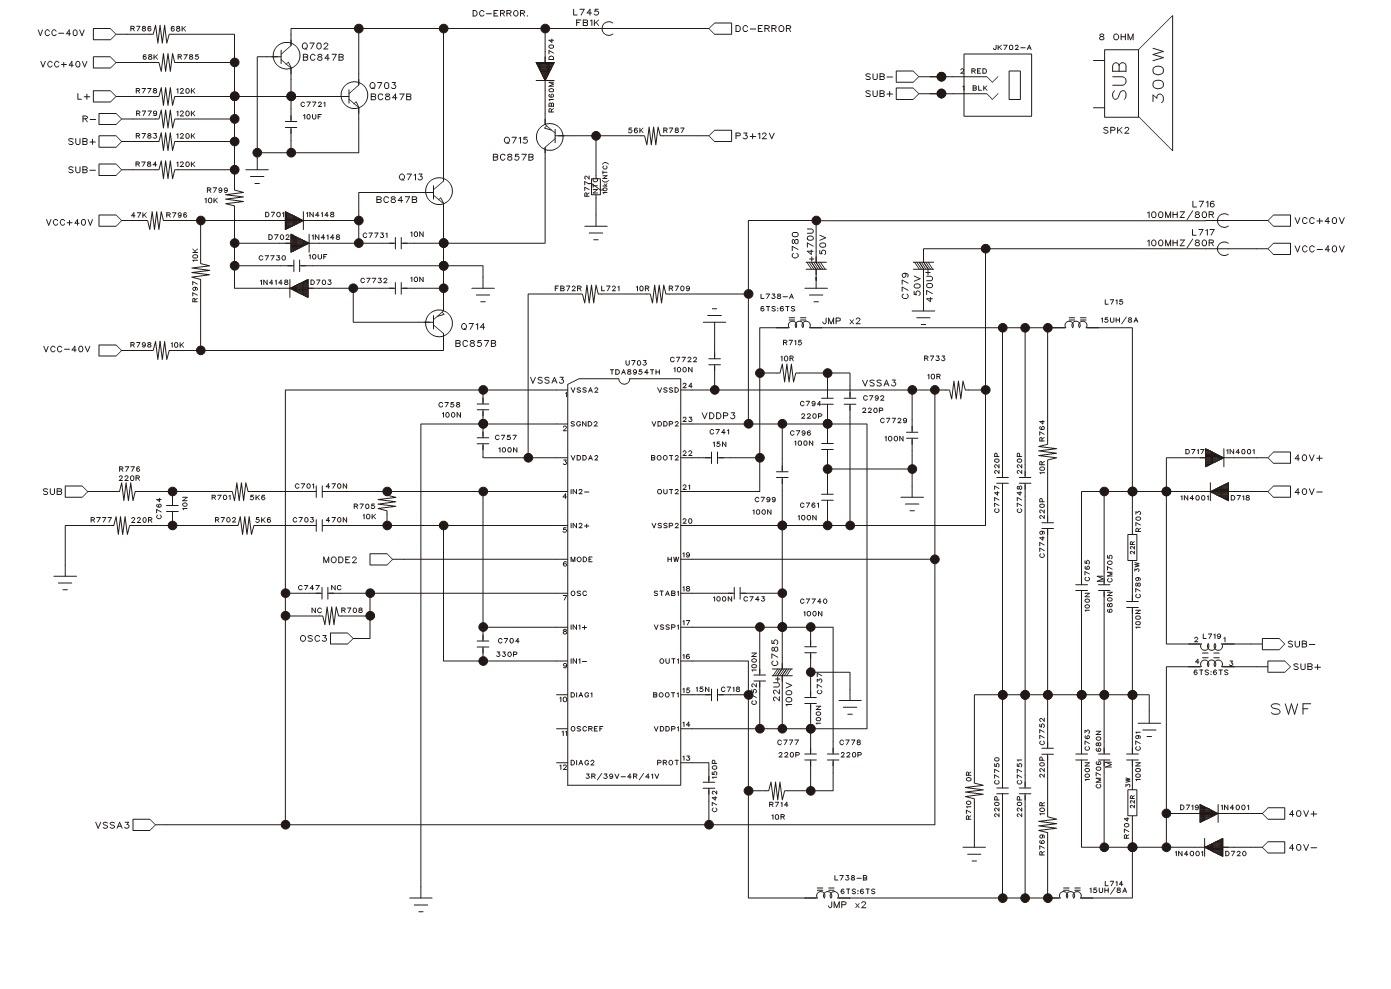 printed circuit board schematics circuit board schematics uniden